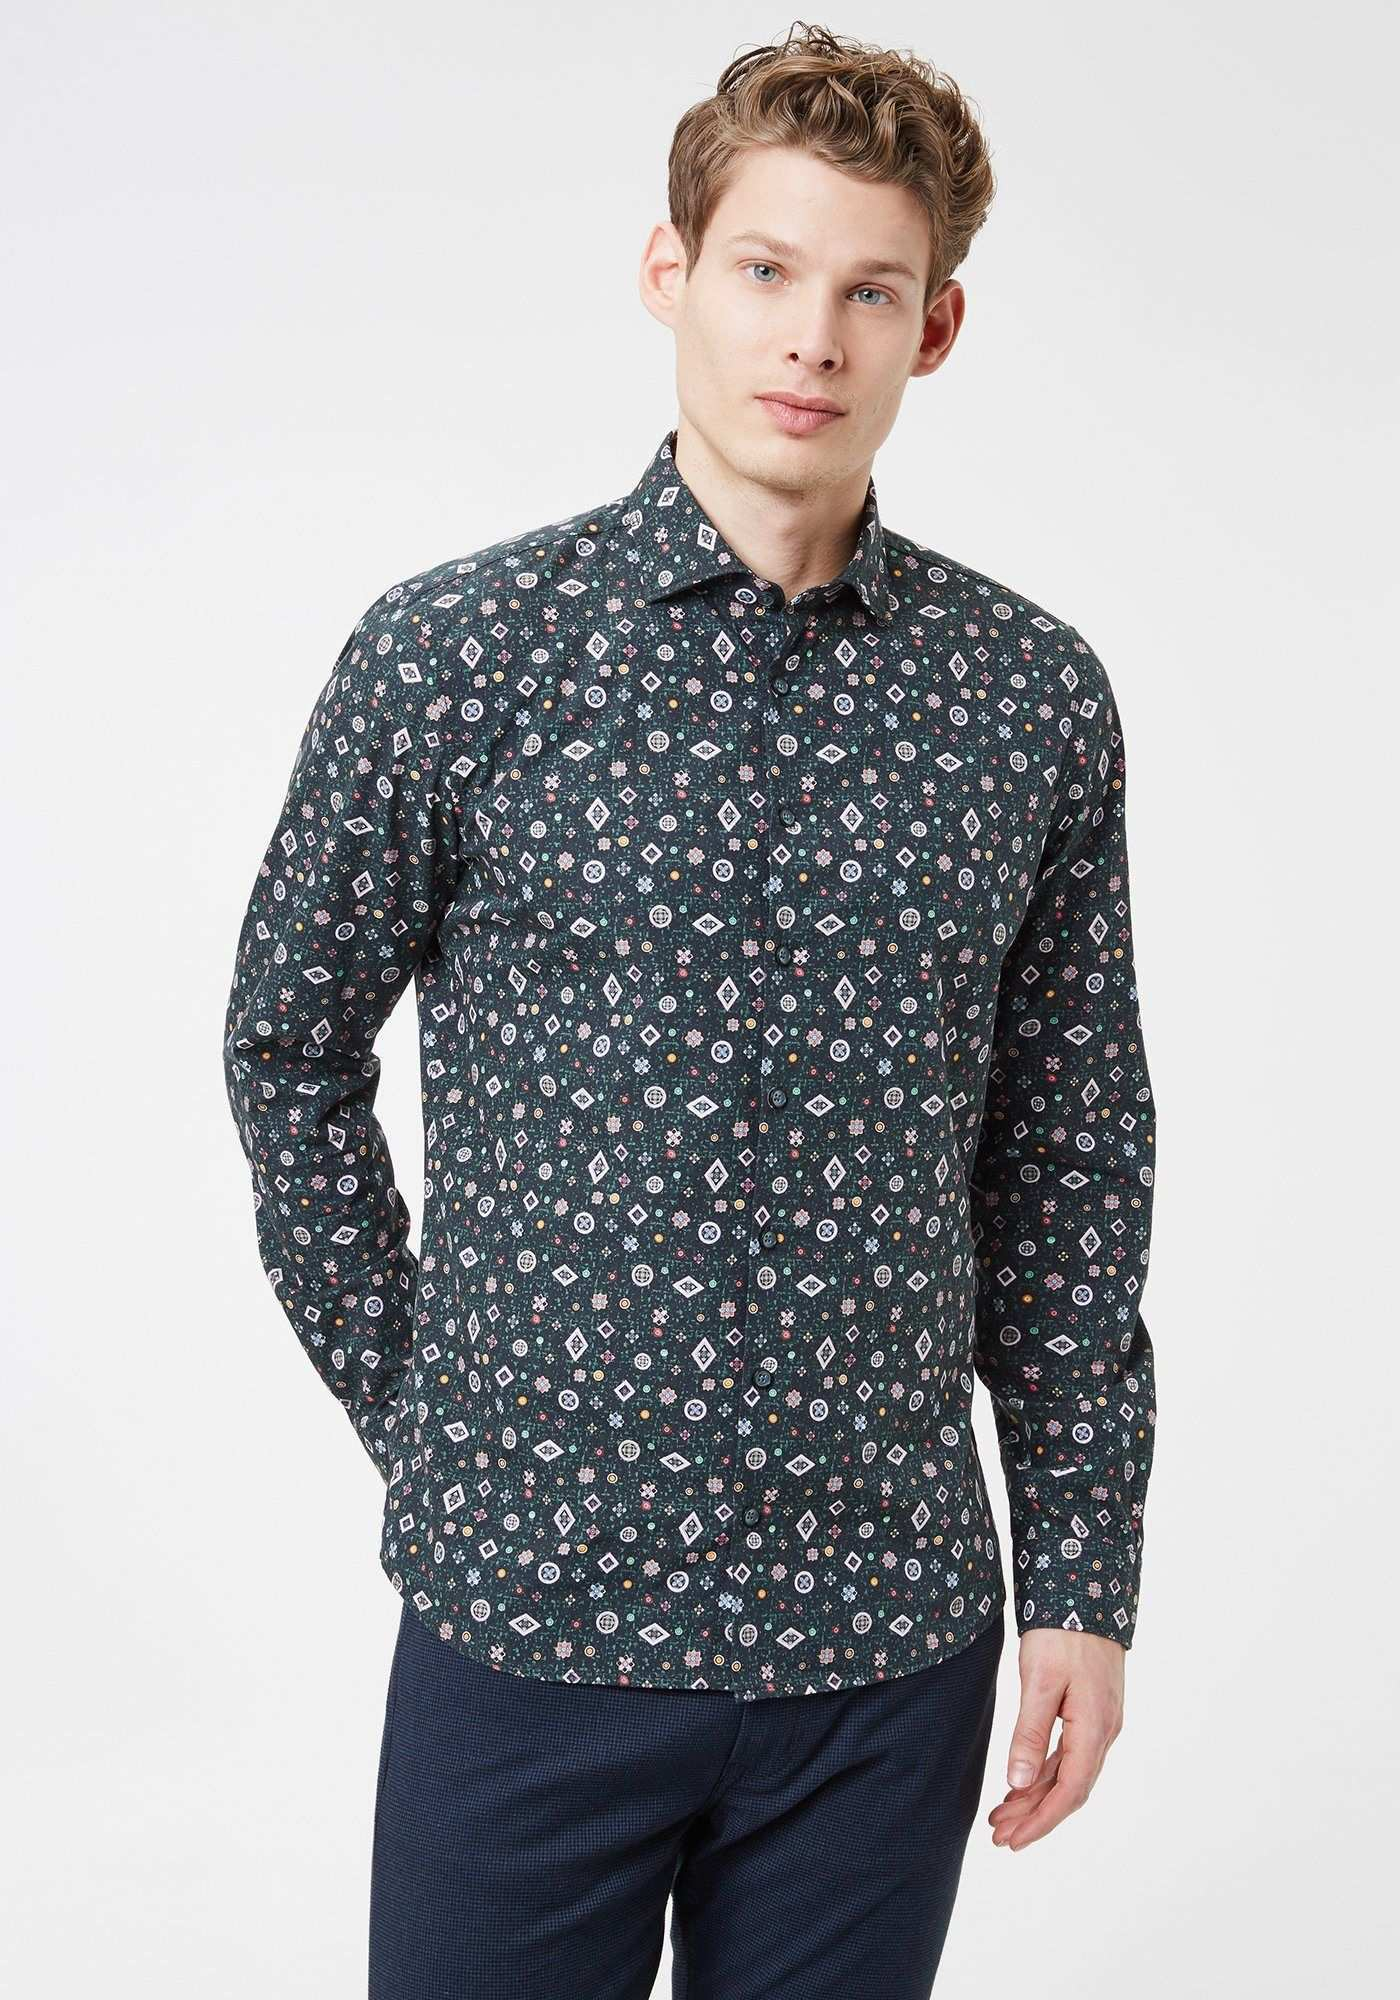 Otto Kern Hemd Popelinehemd Mit Grafikprint Slim Fit Jetzt Bestellen Unter Https Mode Ladendirekt De Herren Bekleidung Hemden S Hemd Herren Mode Modisch